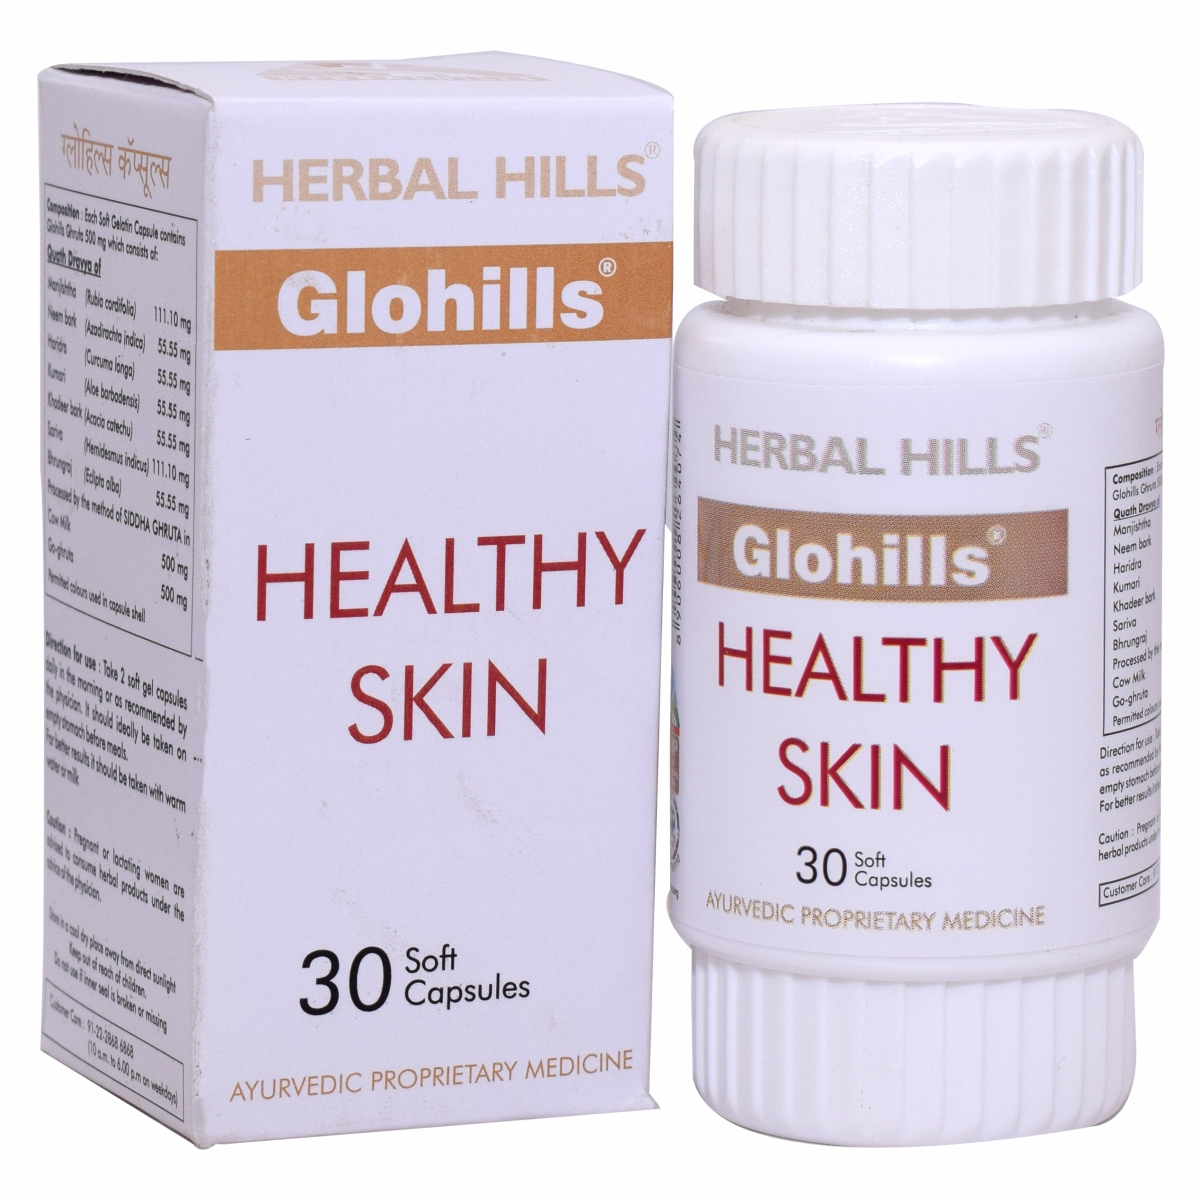 ayurvedic skin care products